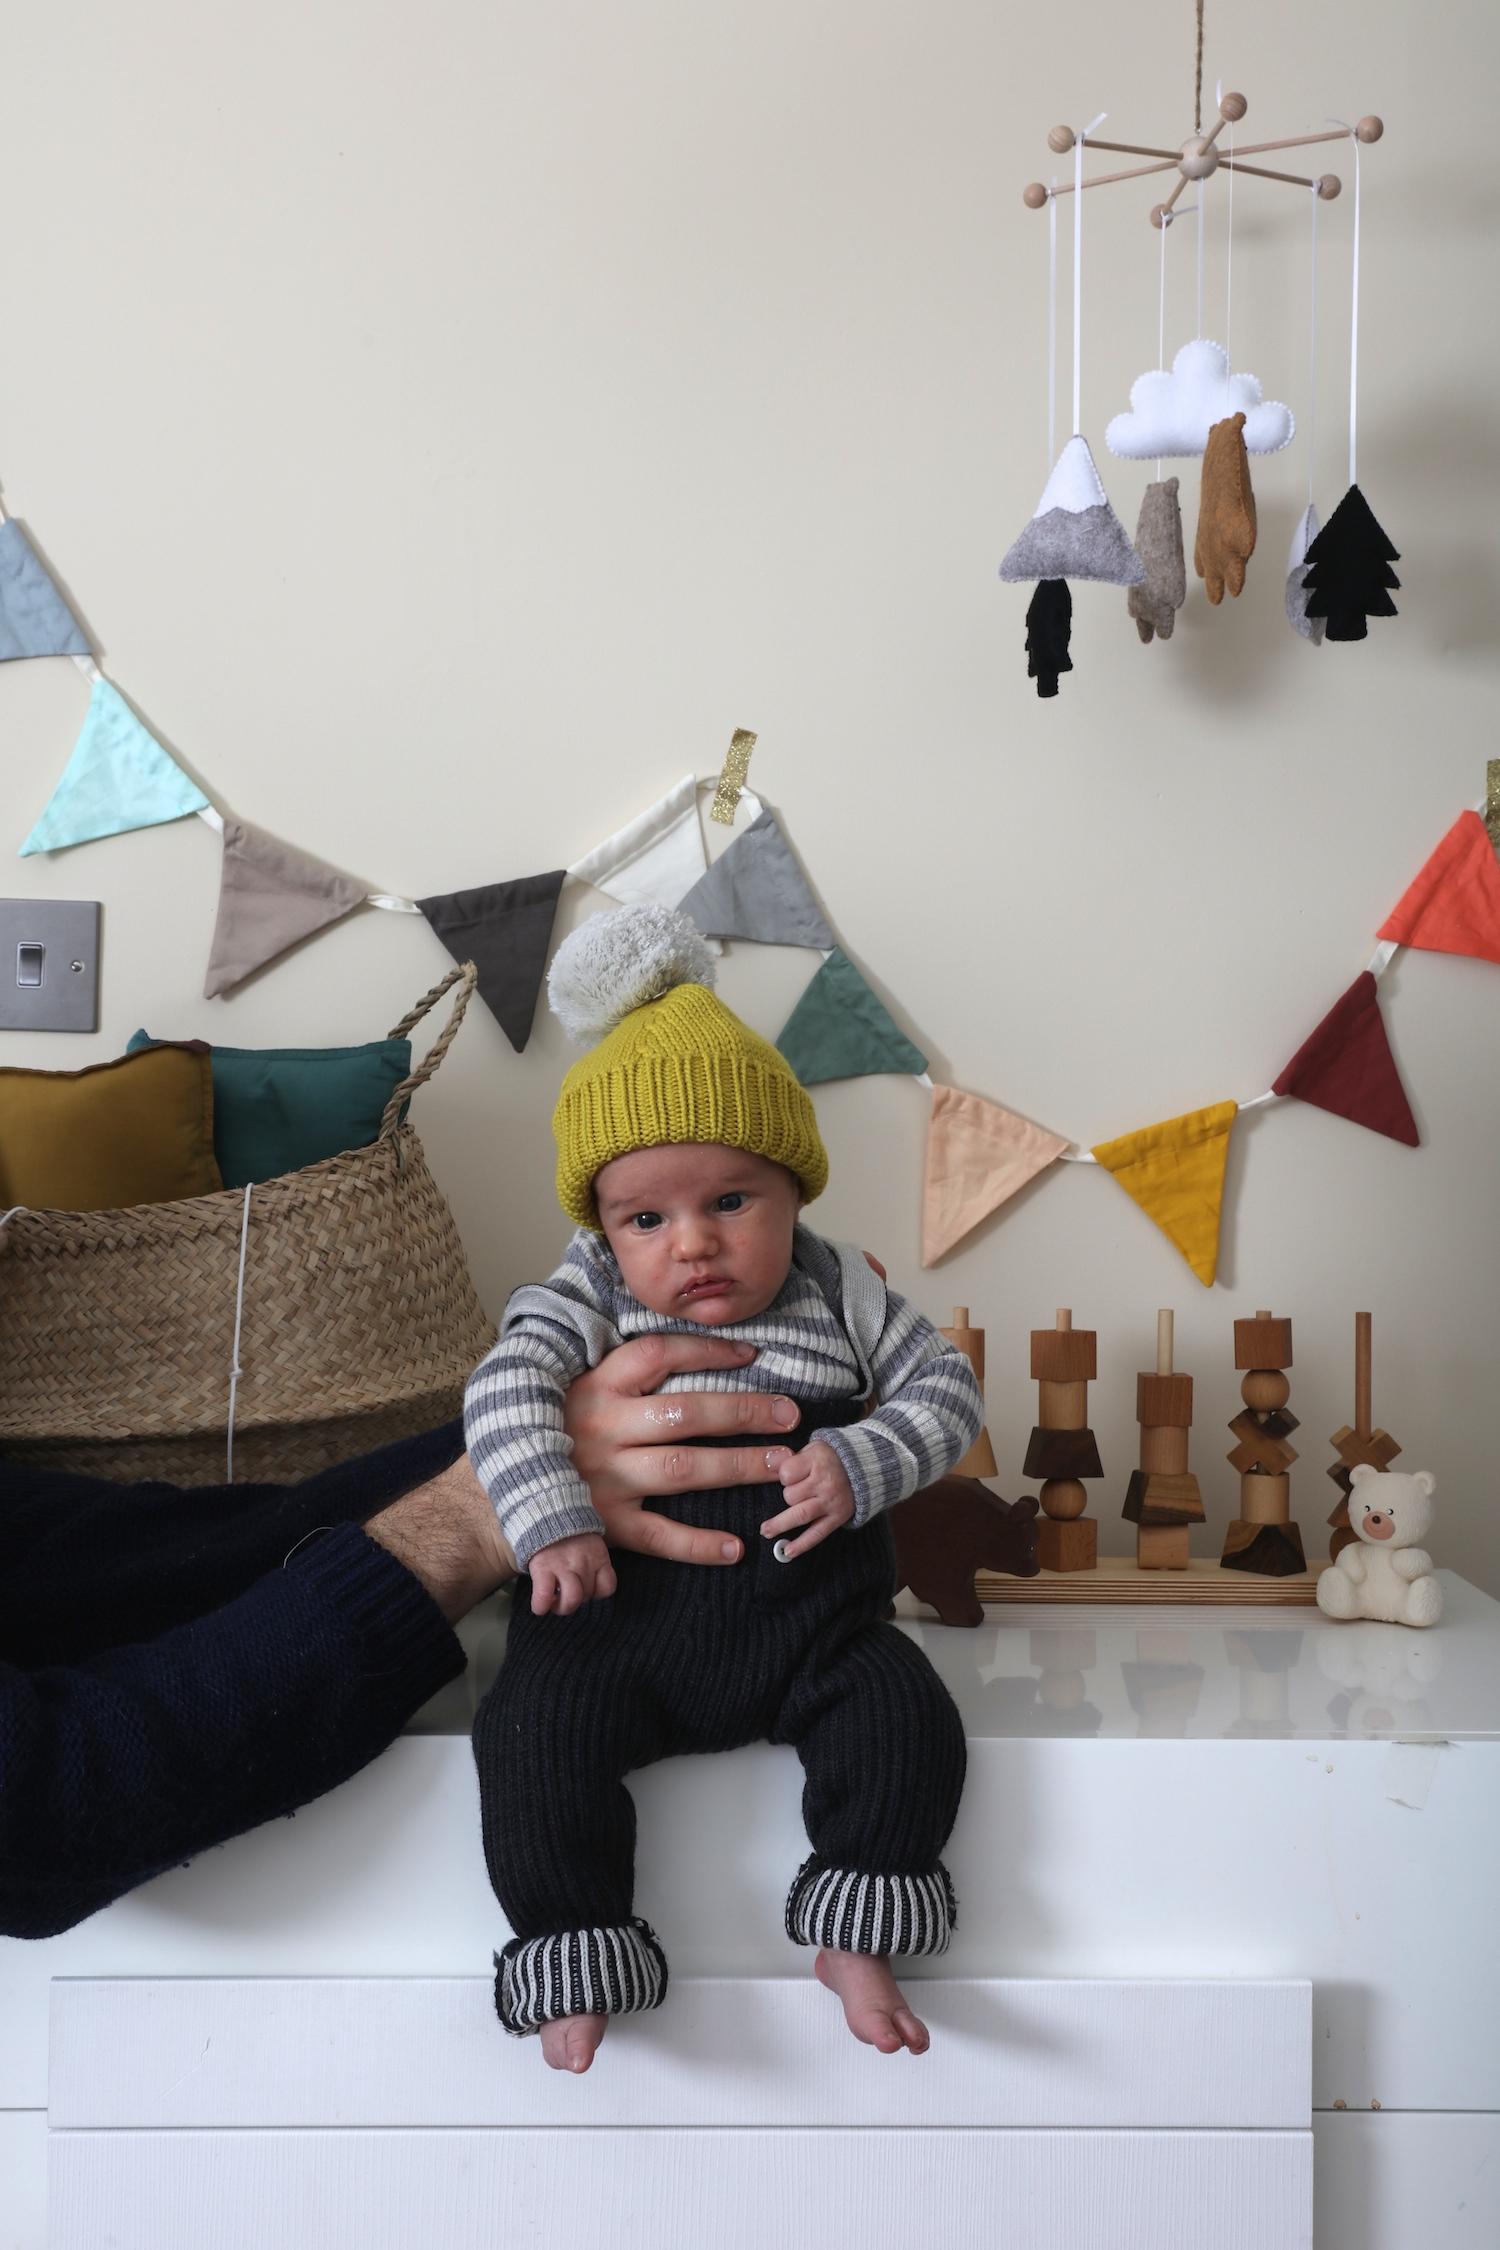 Mabli_knits_dungarees_hat